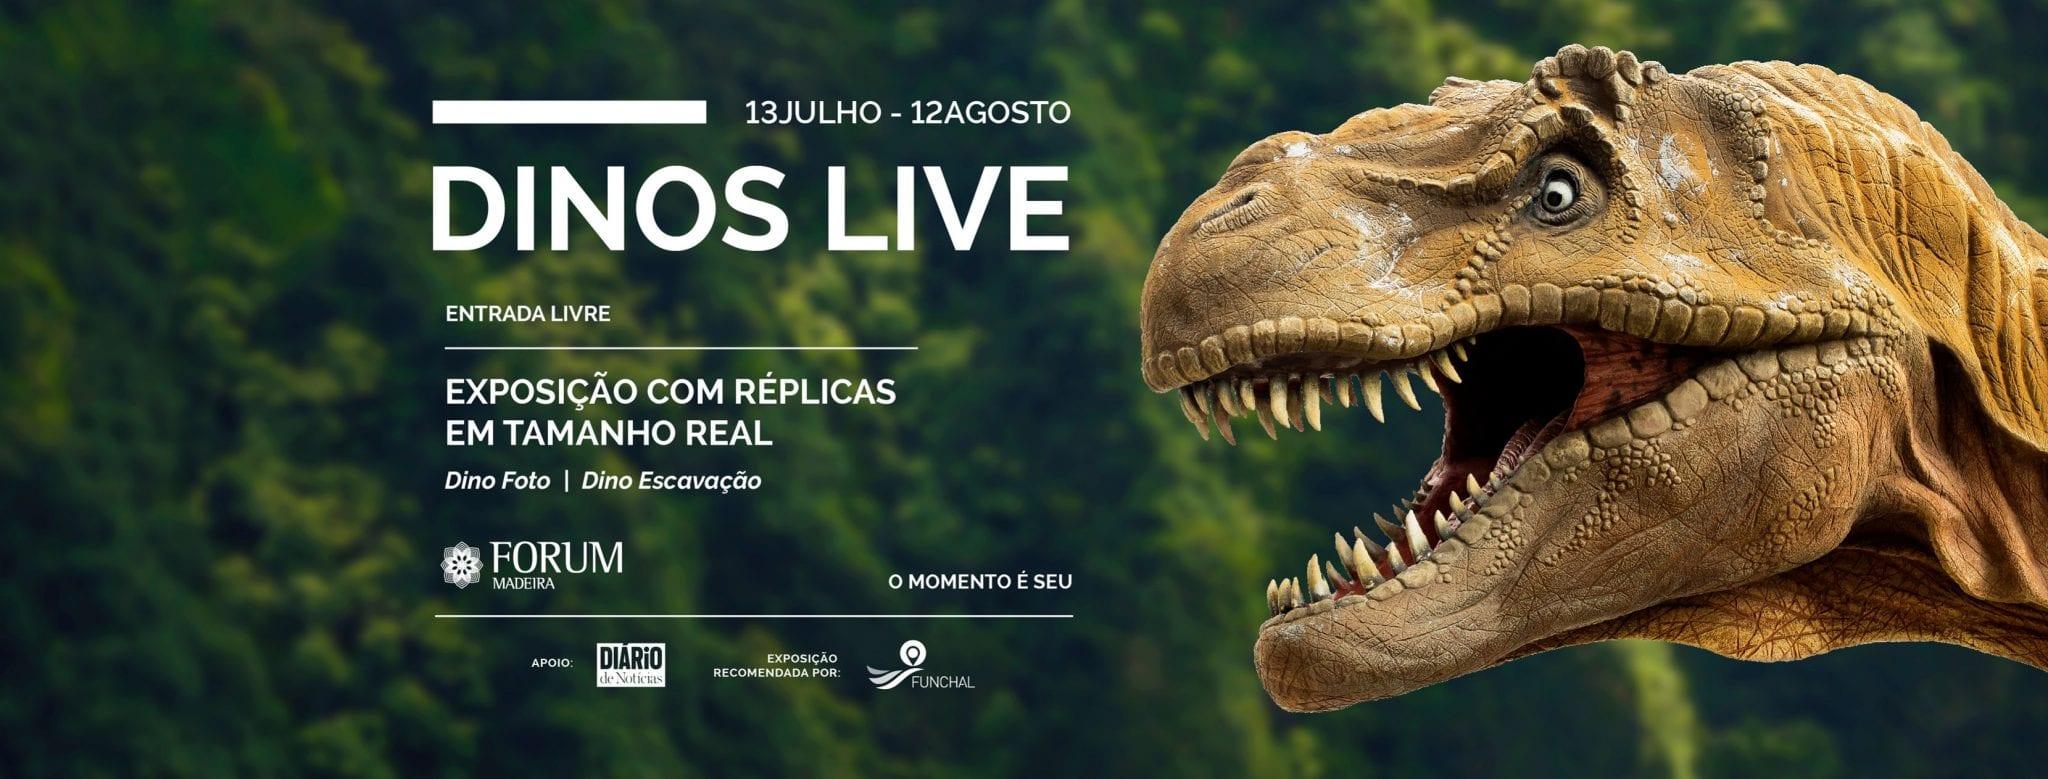 Dinos Live